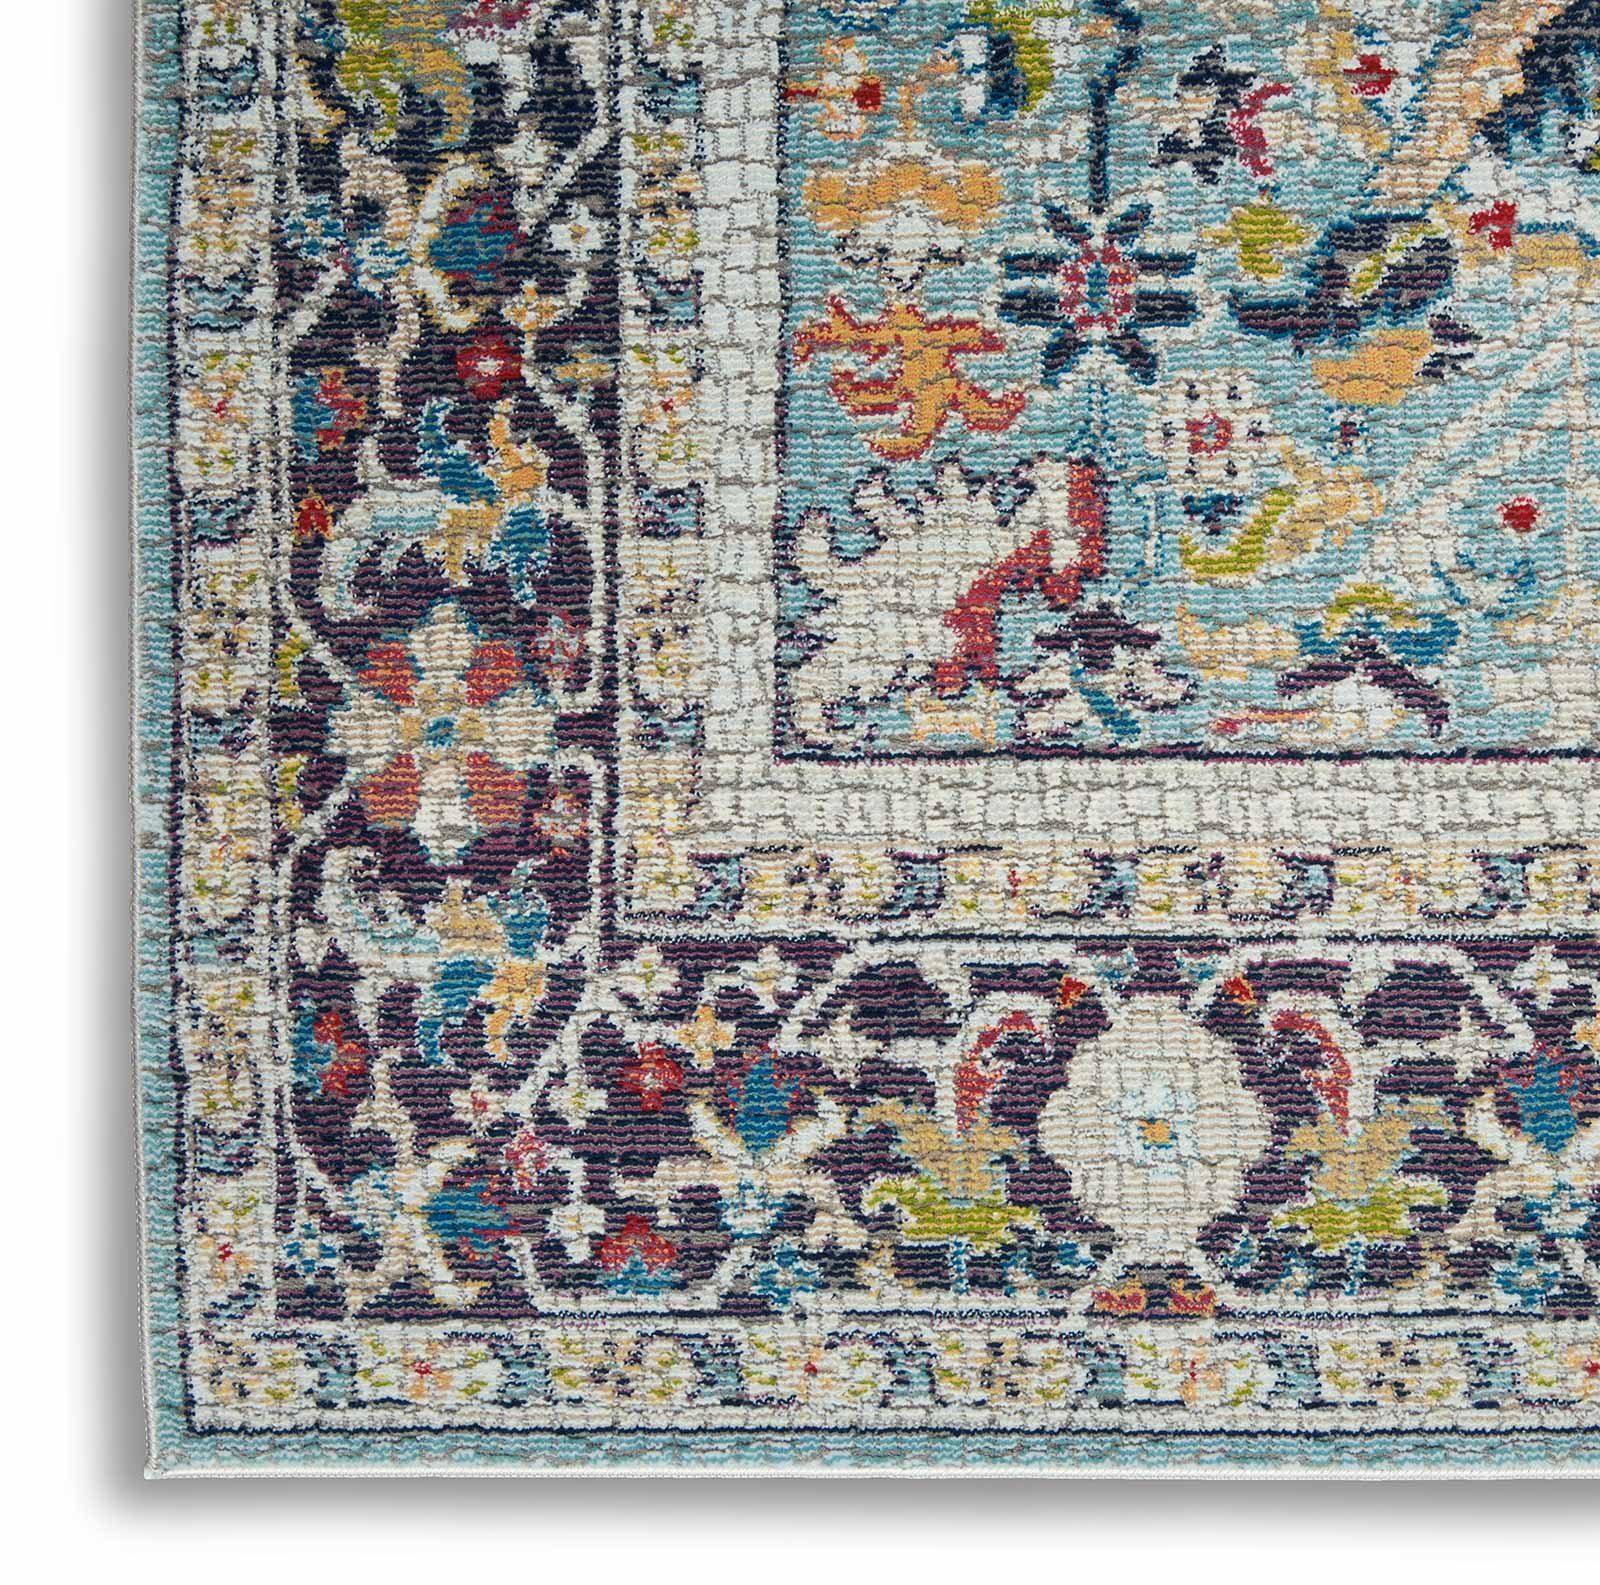 Nourison rug Ankara Global ANR14 TEAL MULTI 5x8 099446498441 CRW C